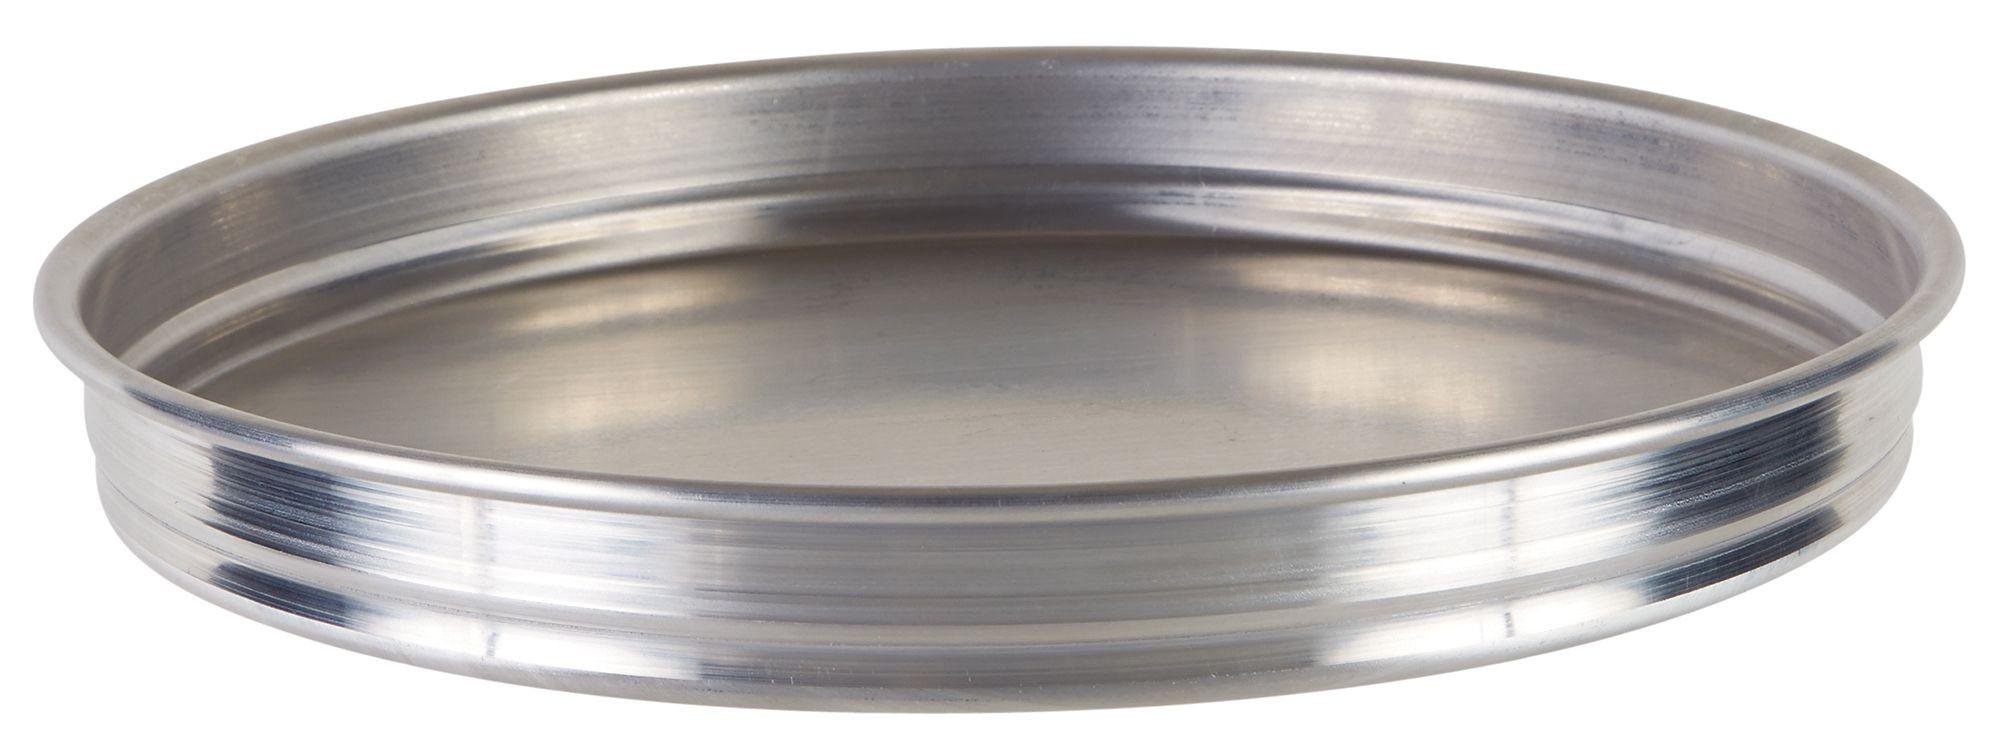 "Winco APZK-1015 10"" x 1-1/2"" Stackable Aluminum Pizza Pan"